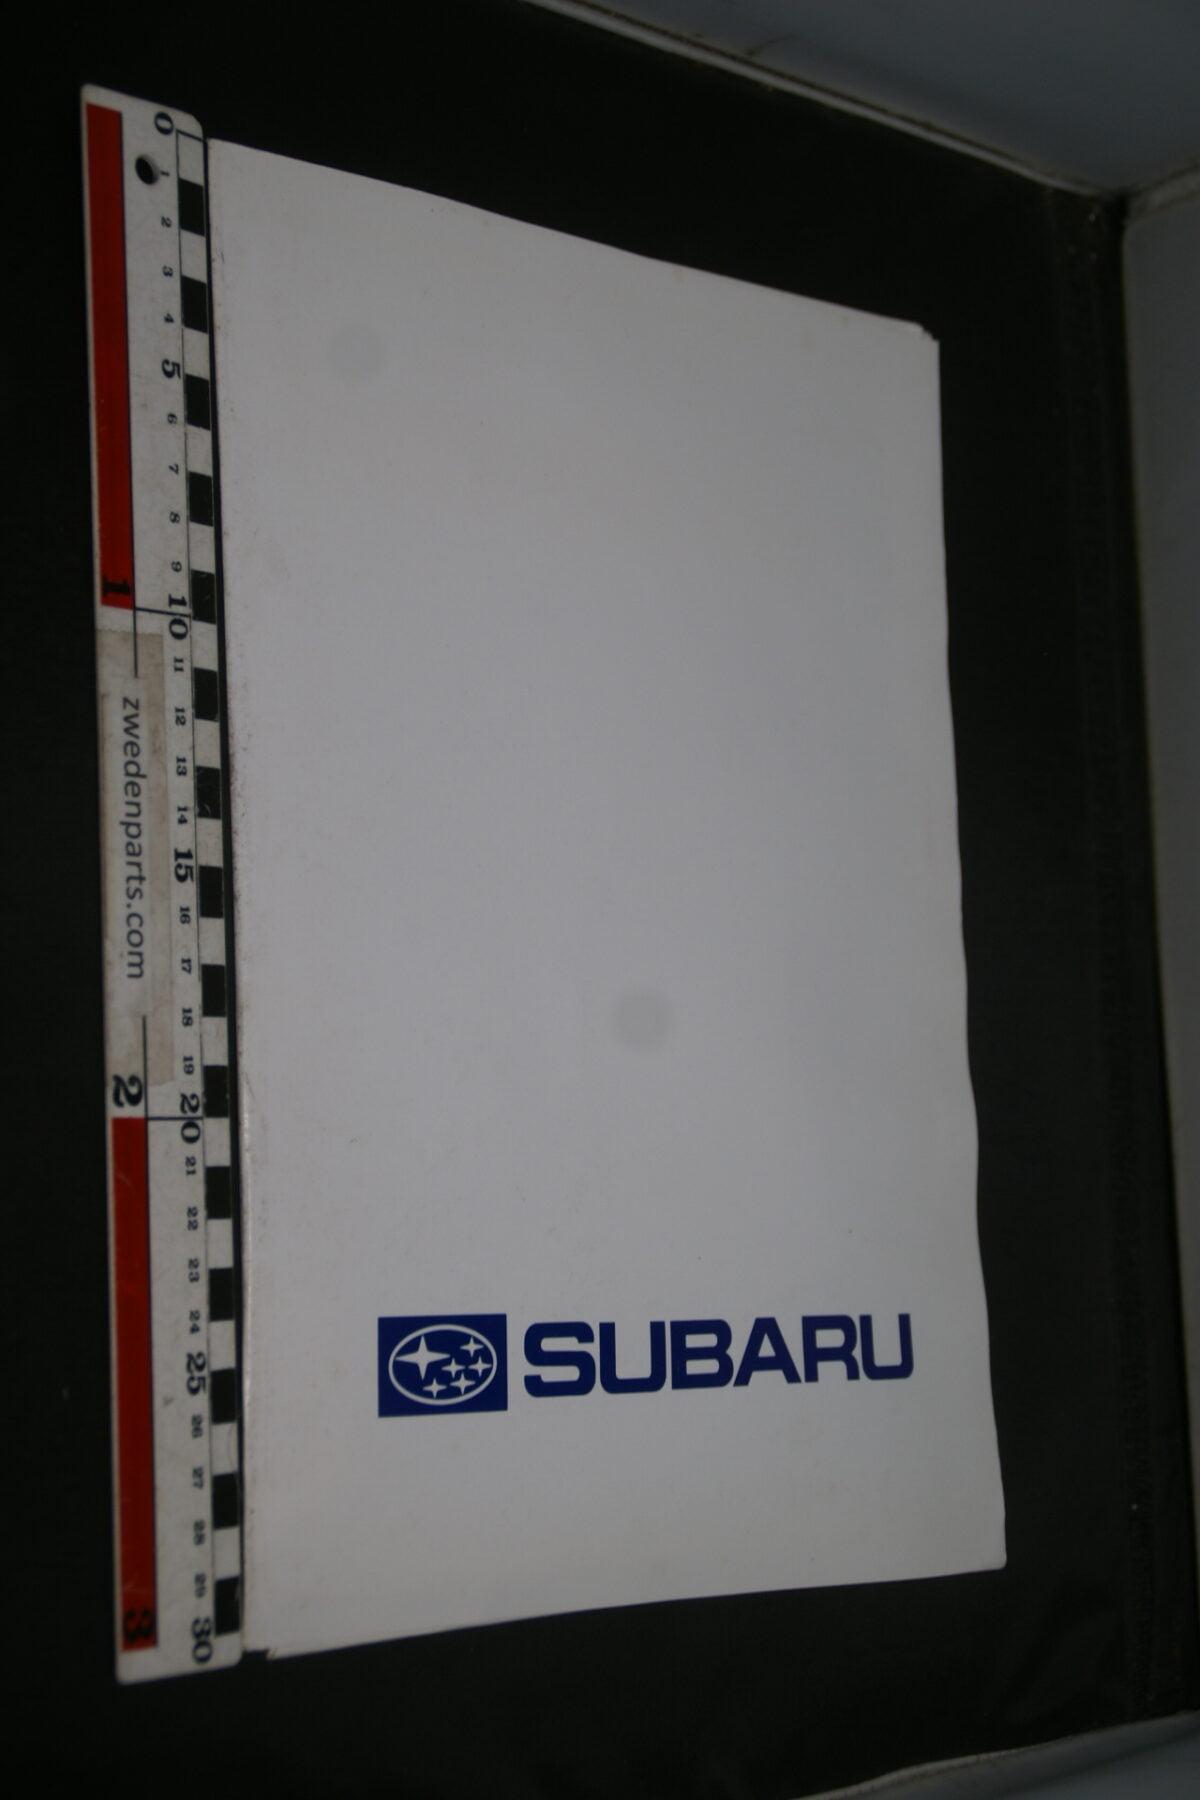 DSC02411 1996 originele persmap Brussel Subaru-f495c21a